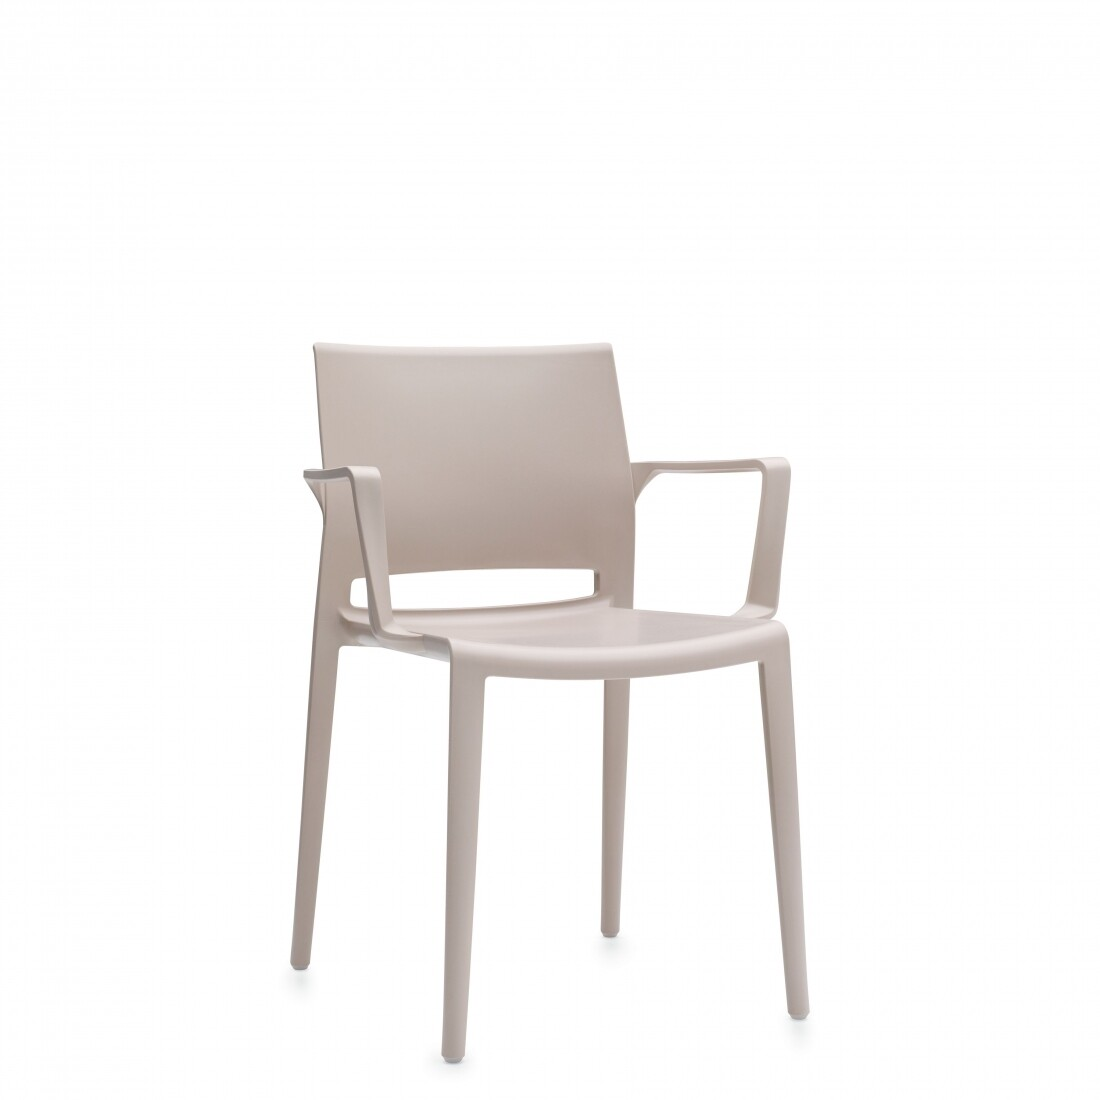 Global Bakhita Stackable Plastic Chair (4 Pack)